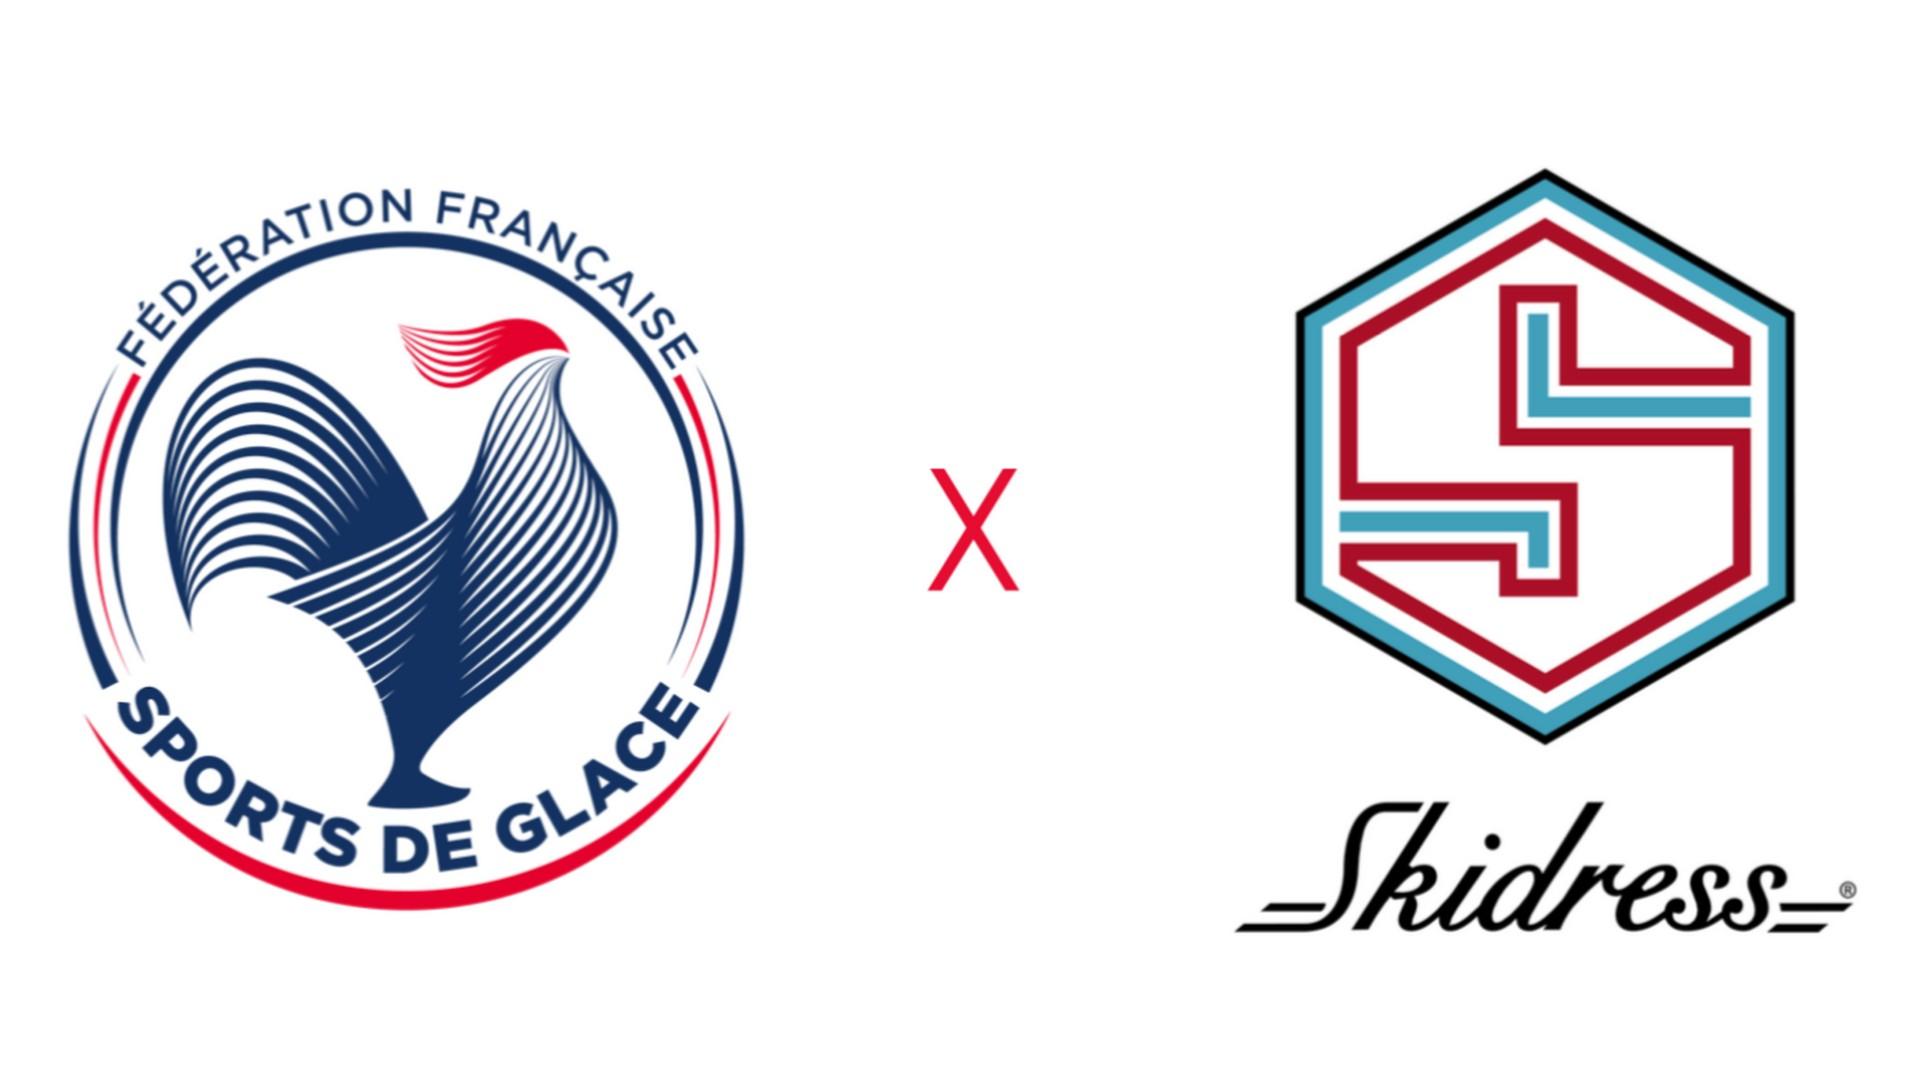 Skidress x FFSG (Sports d'hiver) 2020